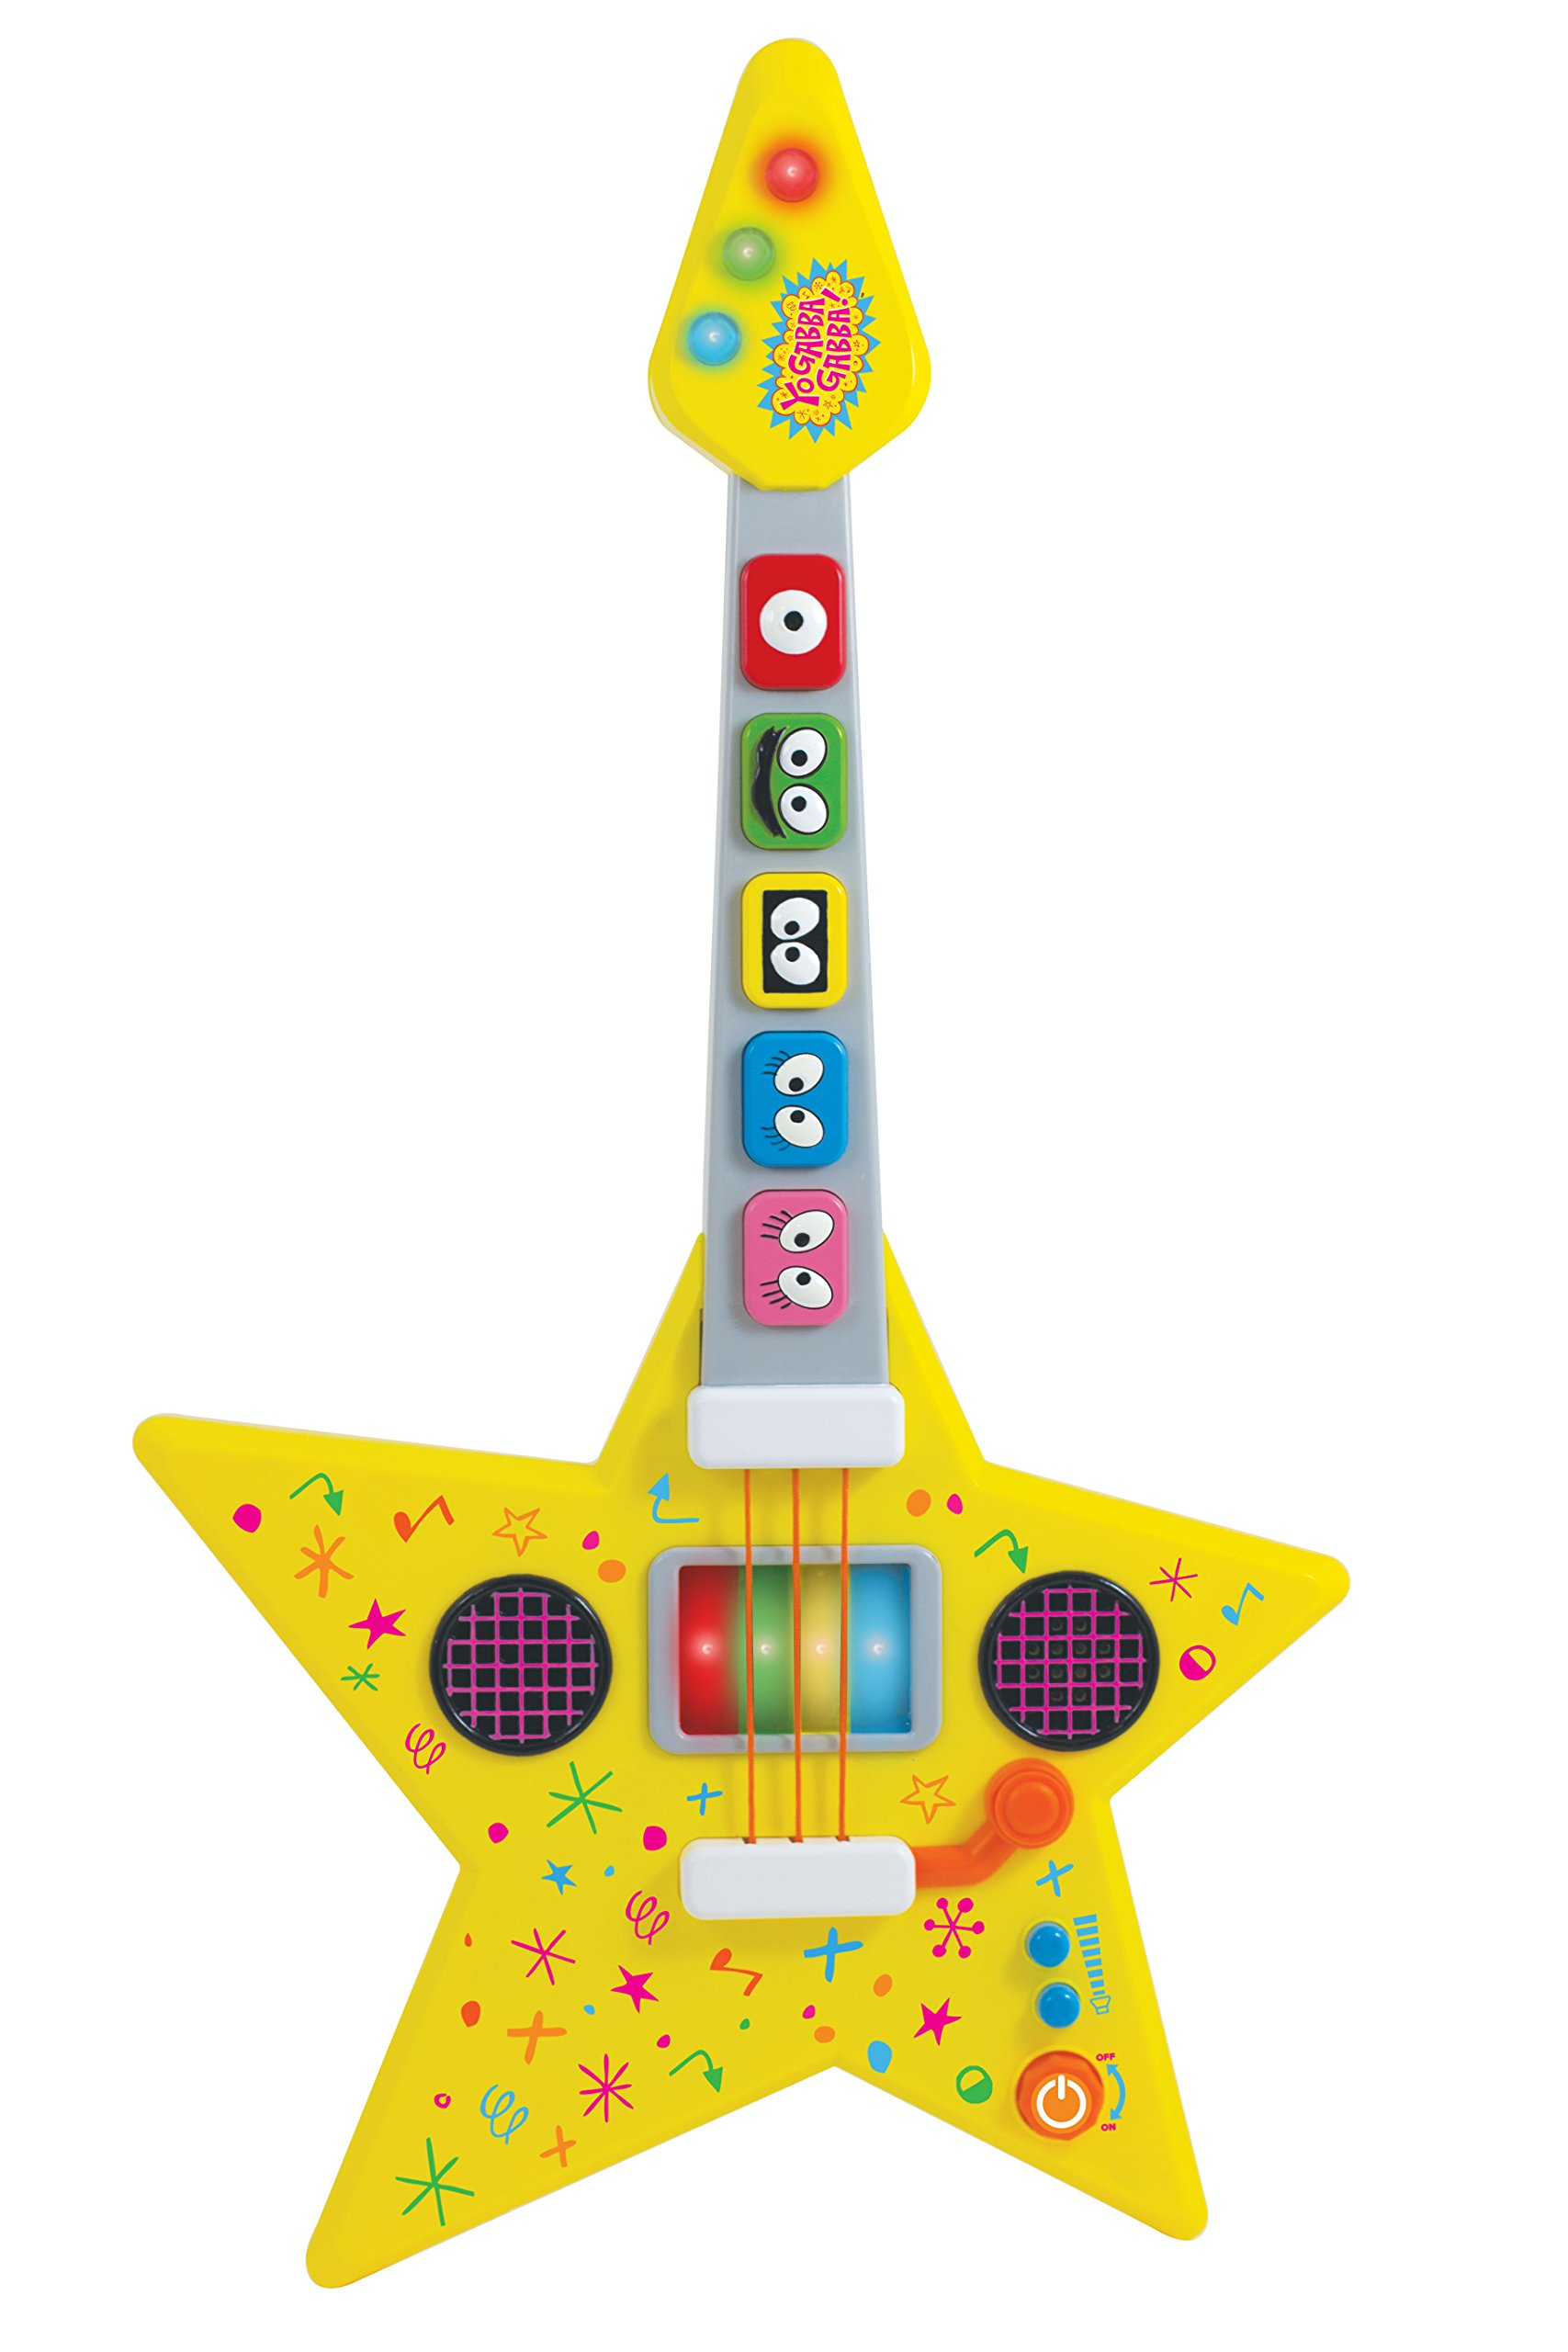 YO GABBA GABBA Feature Guitar Musical Instrument by Yo Gabba Gabba